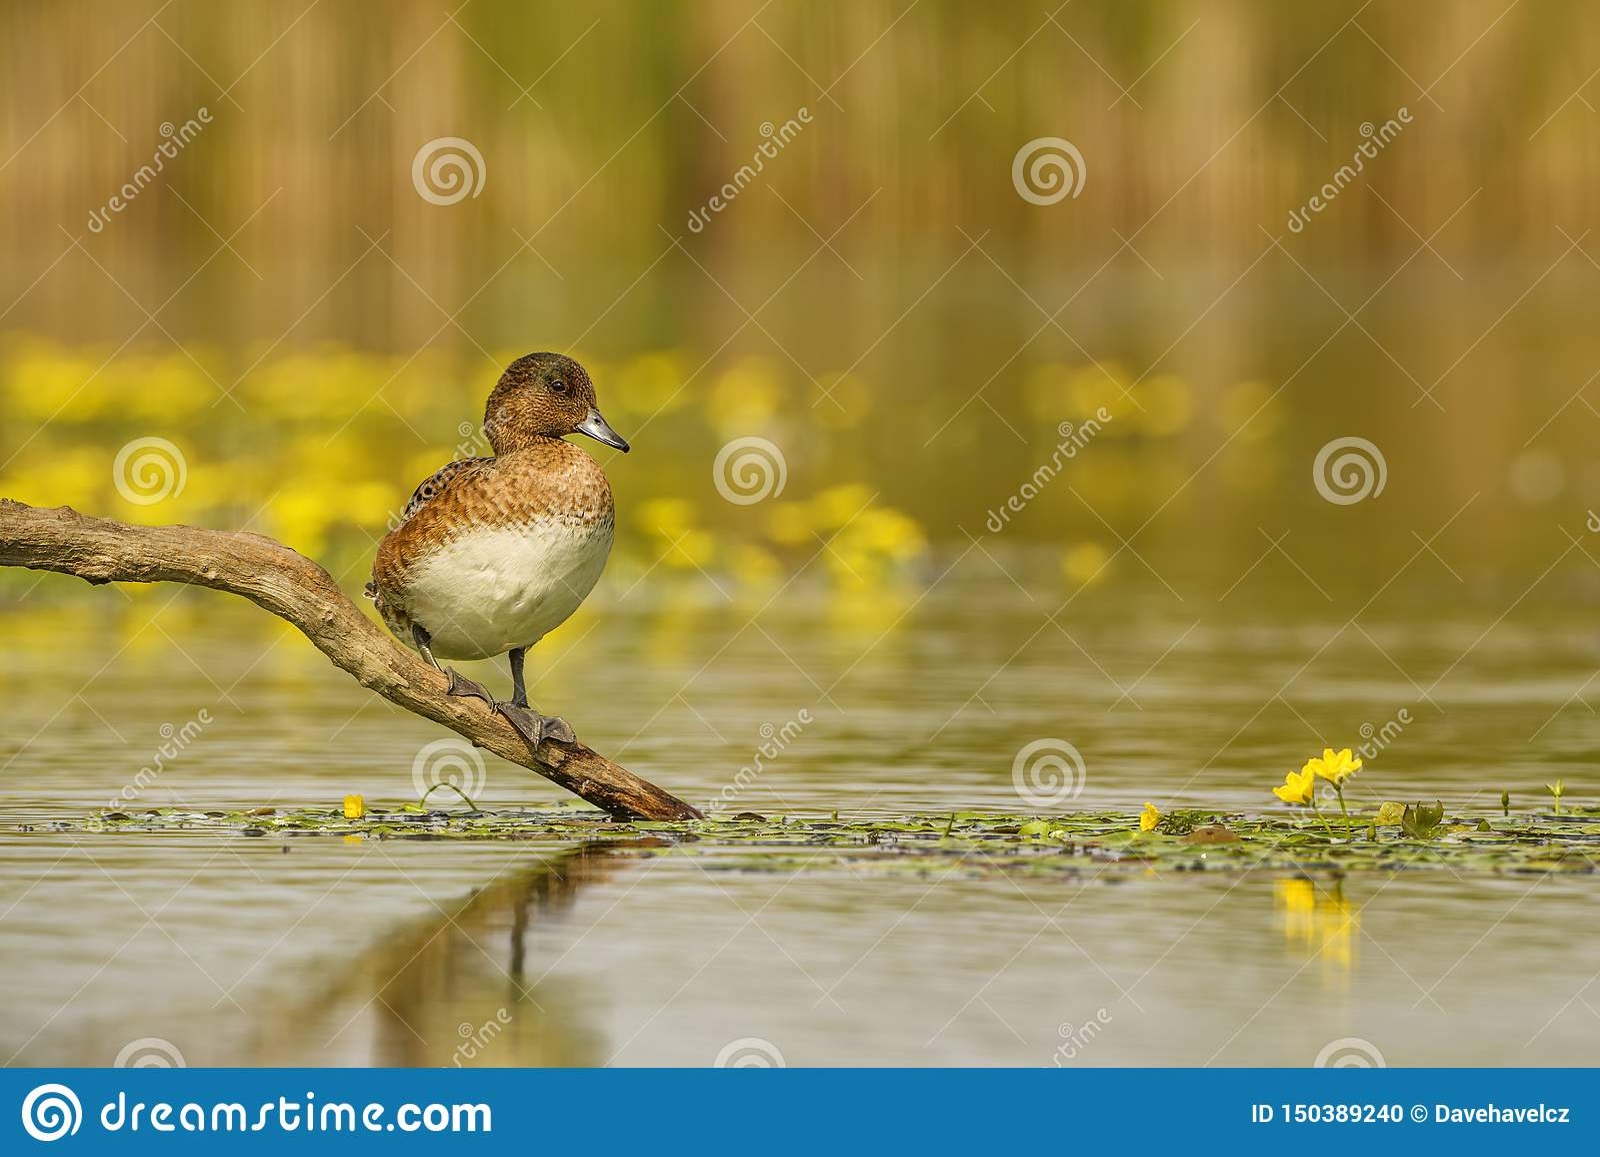 Eurasian Wigeon - Anas penelope